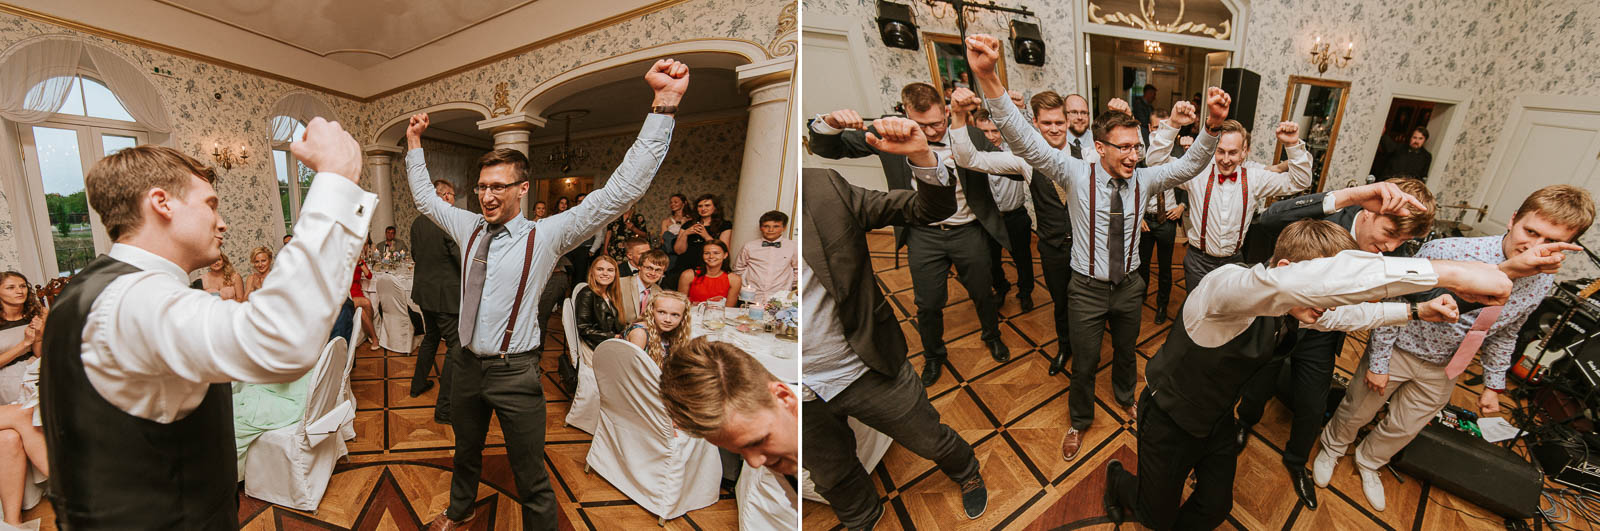 Liisa-Andreas-pulm-padise-mois-manor-069